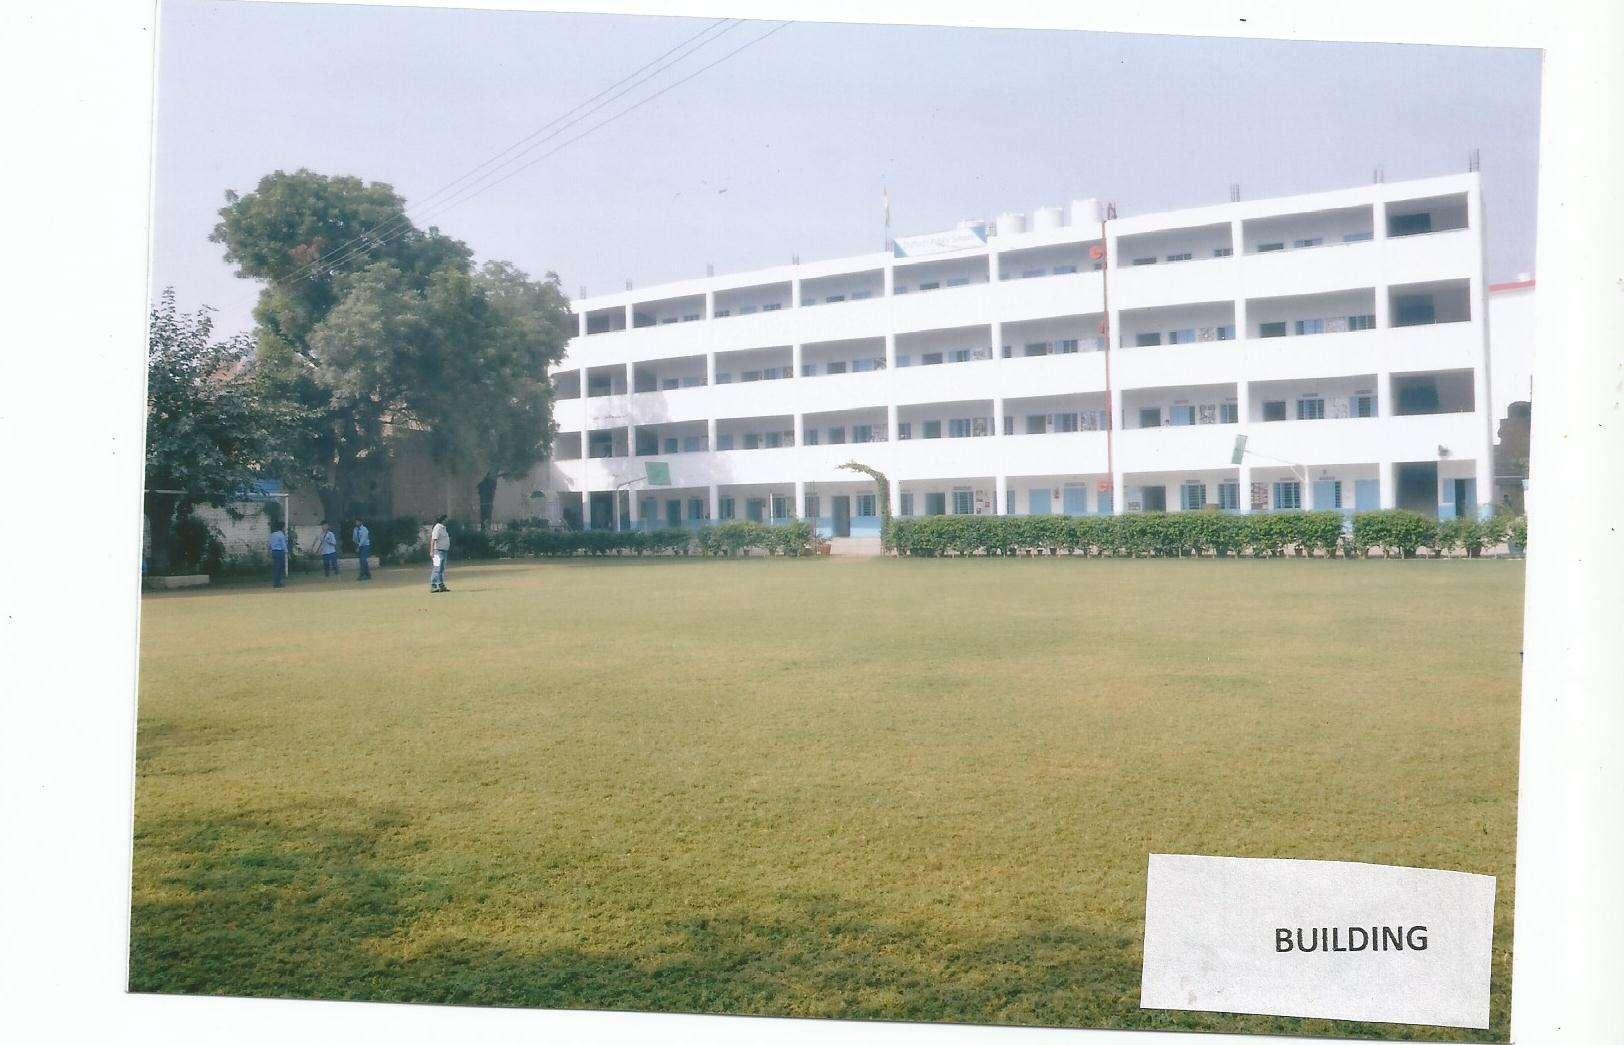 Daffodil Public School Main Road, Swatantra Nagar, Narela - The